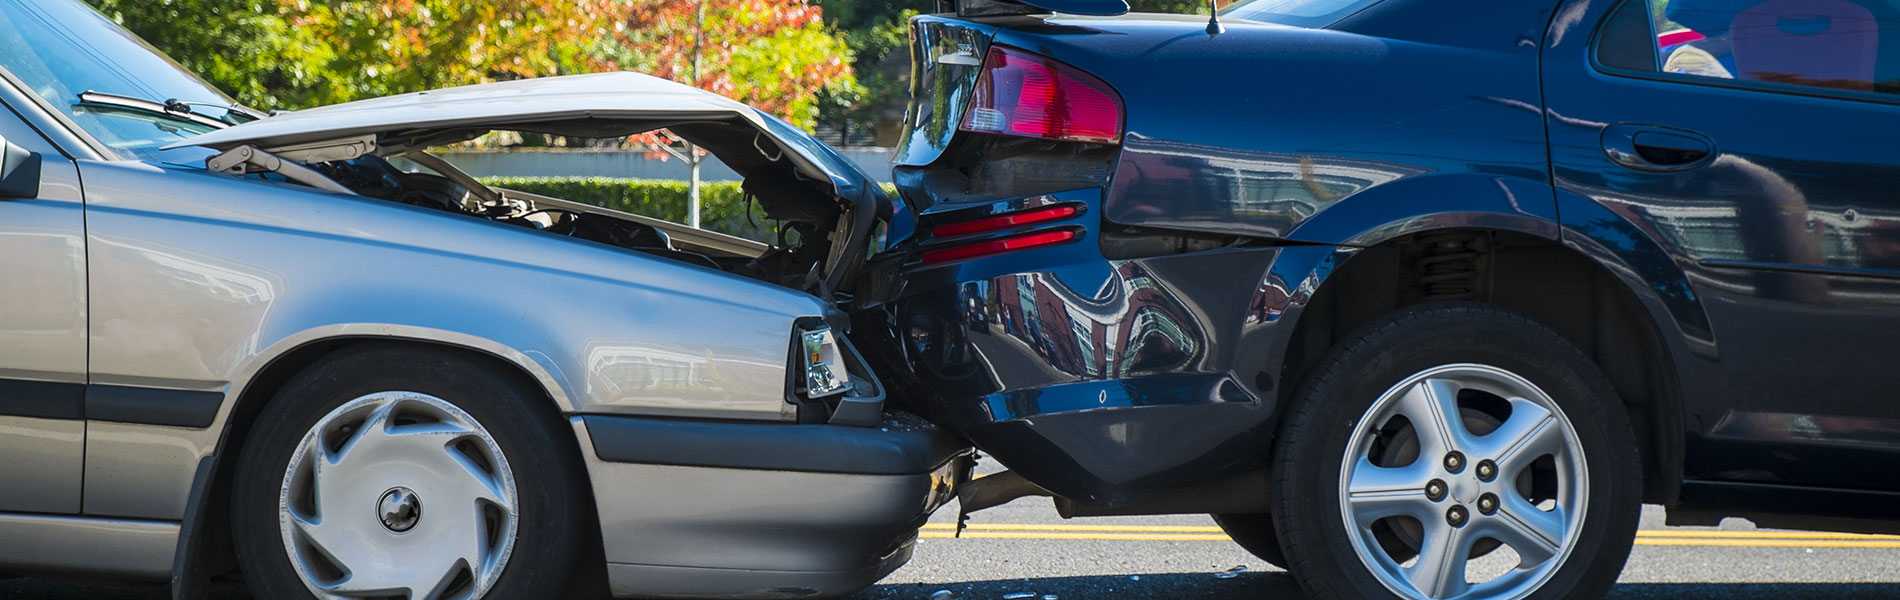 Seminole County Rear-End Accident Attorney